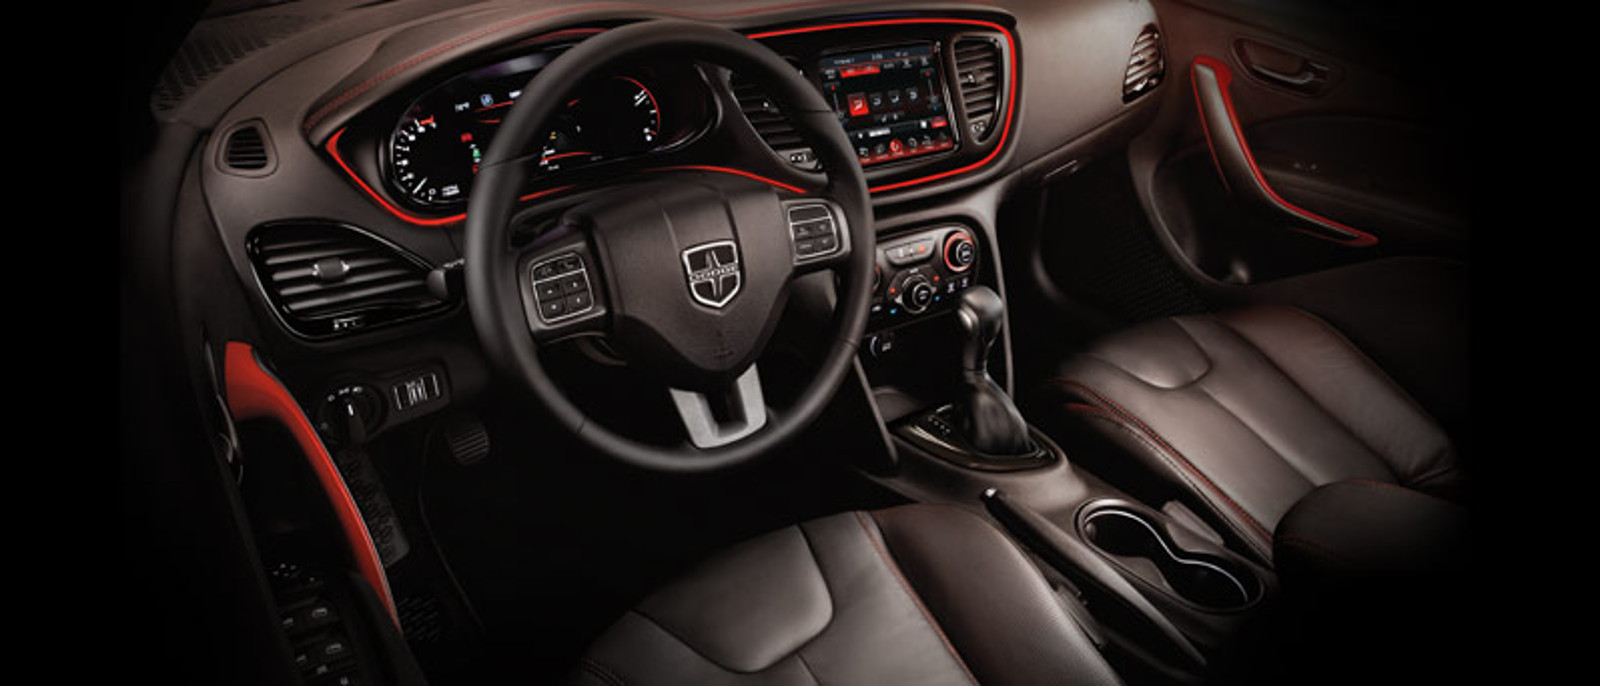 2014 Dodge Dart Interior